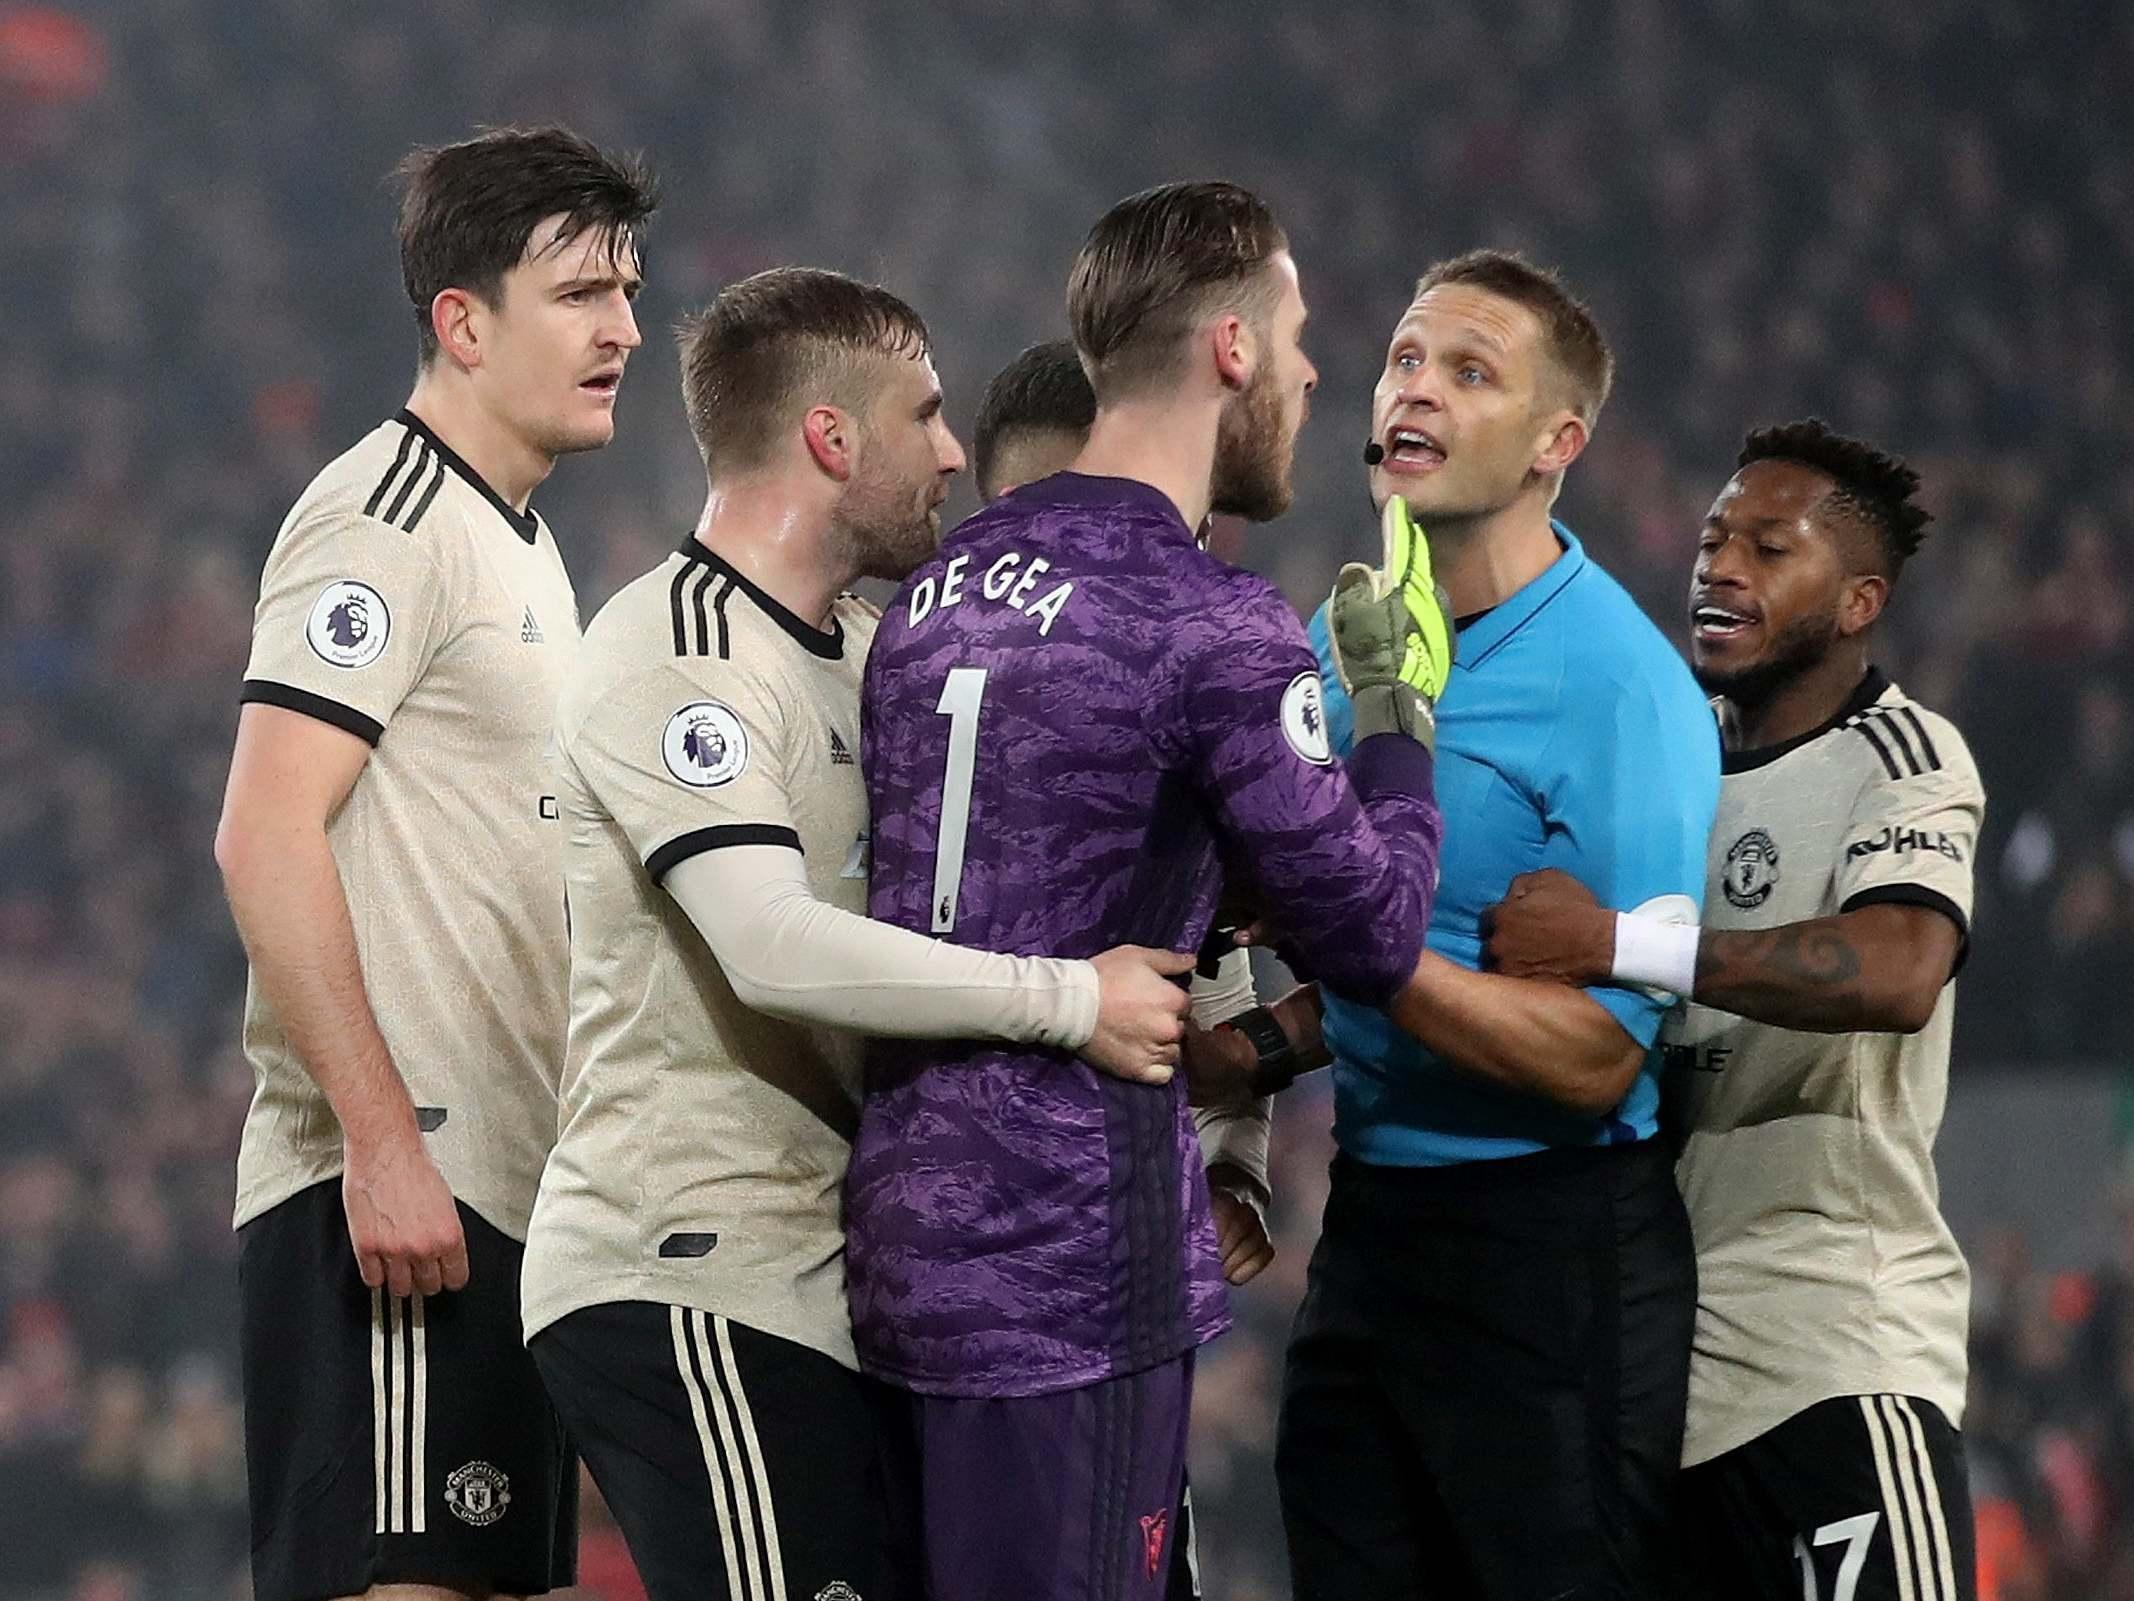 Футболисты Манчестер Юнайтед окружили арбитра